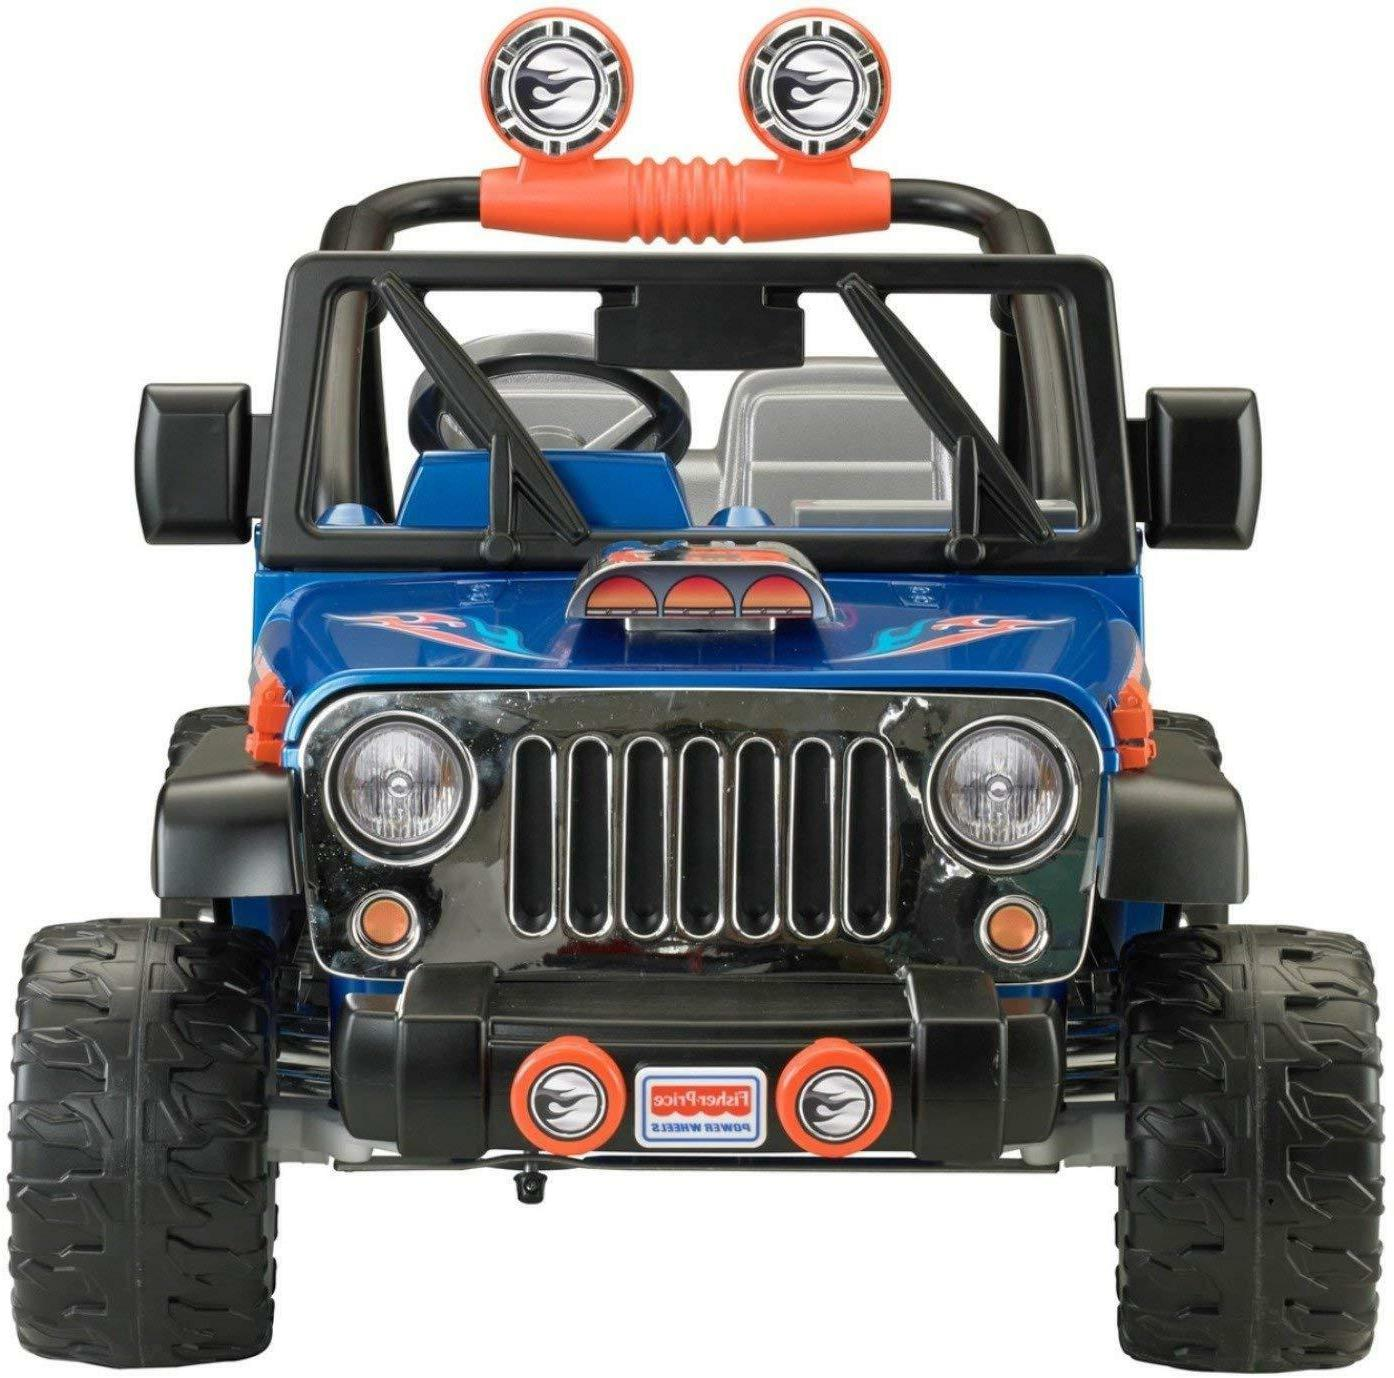 12V 2 JEEP WRANGLER KIDS ON CAR SUV 2 SPEED/DIRECTIONS